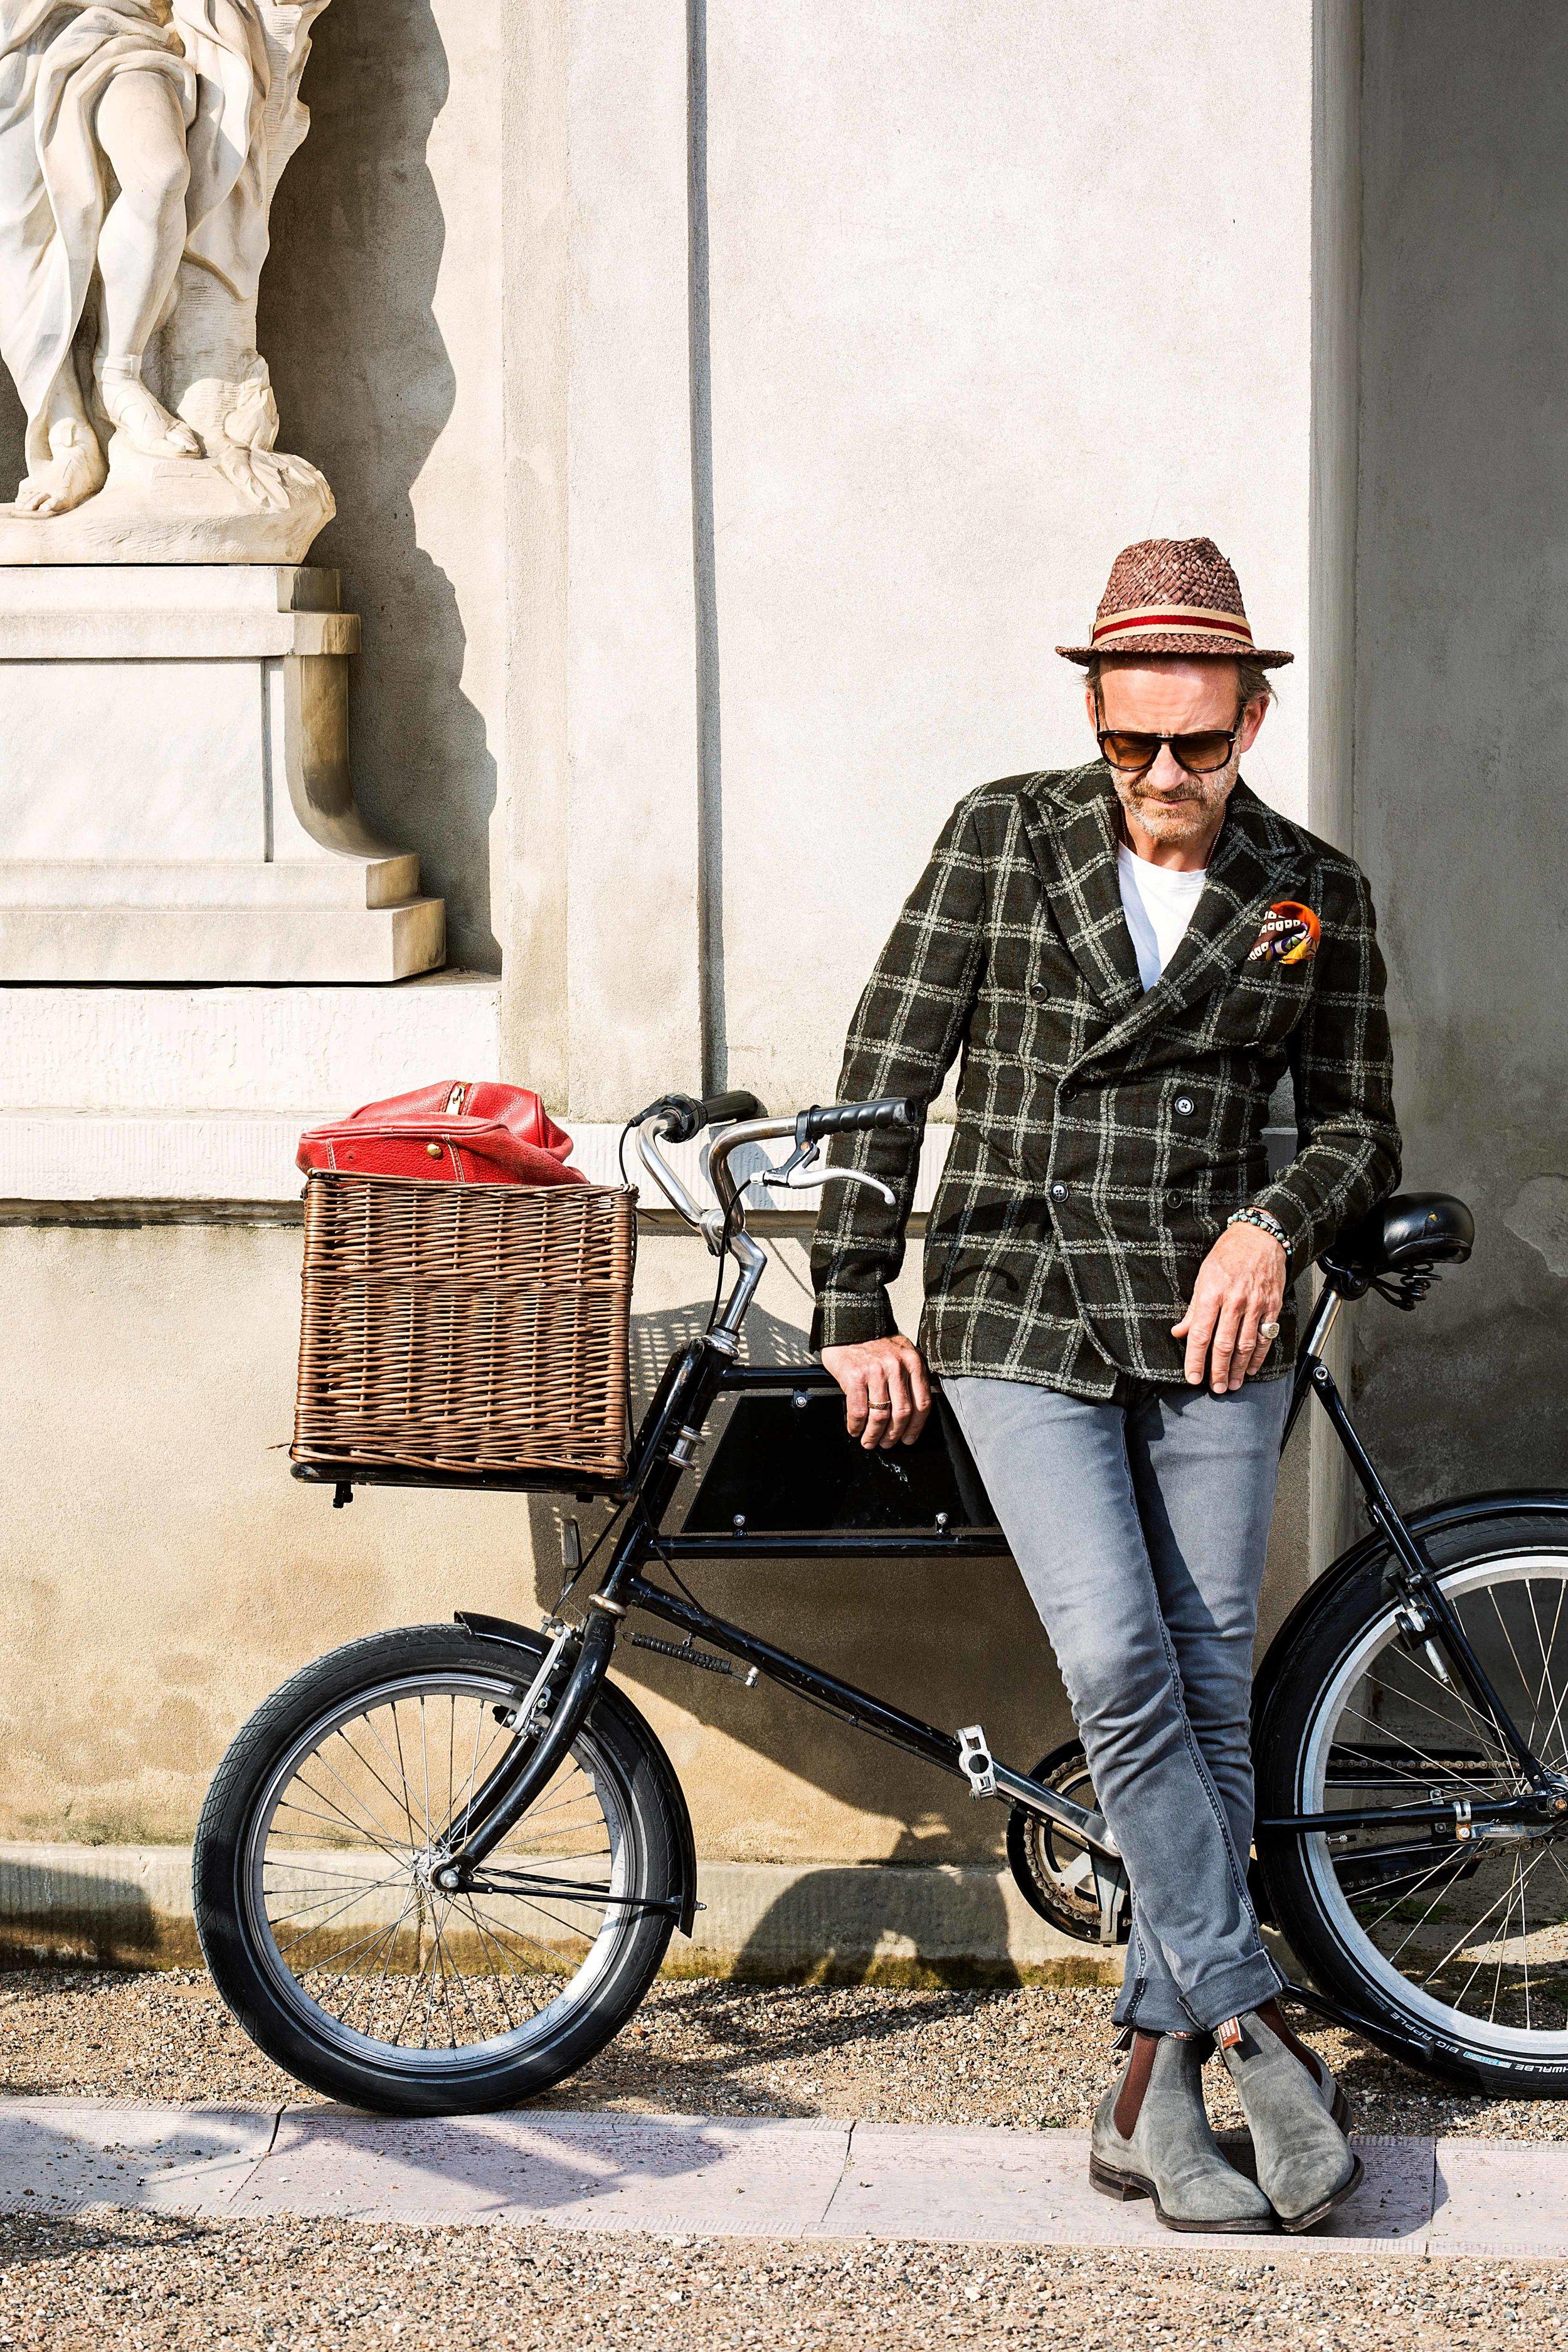 børsen pleasure // creative director, Jakob Blom